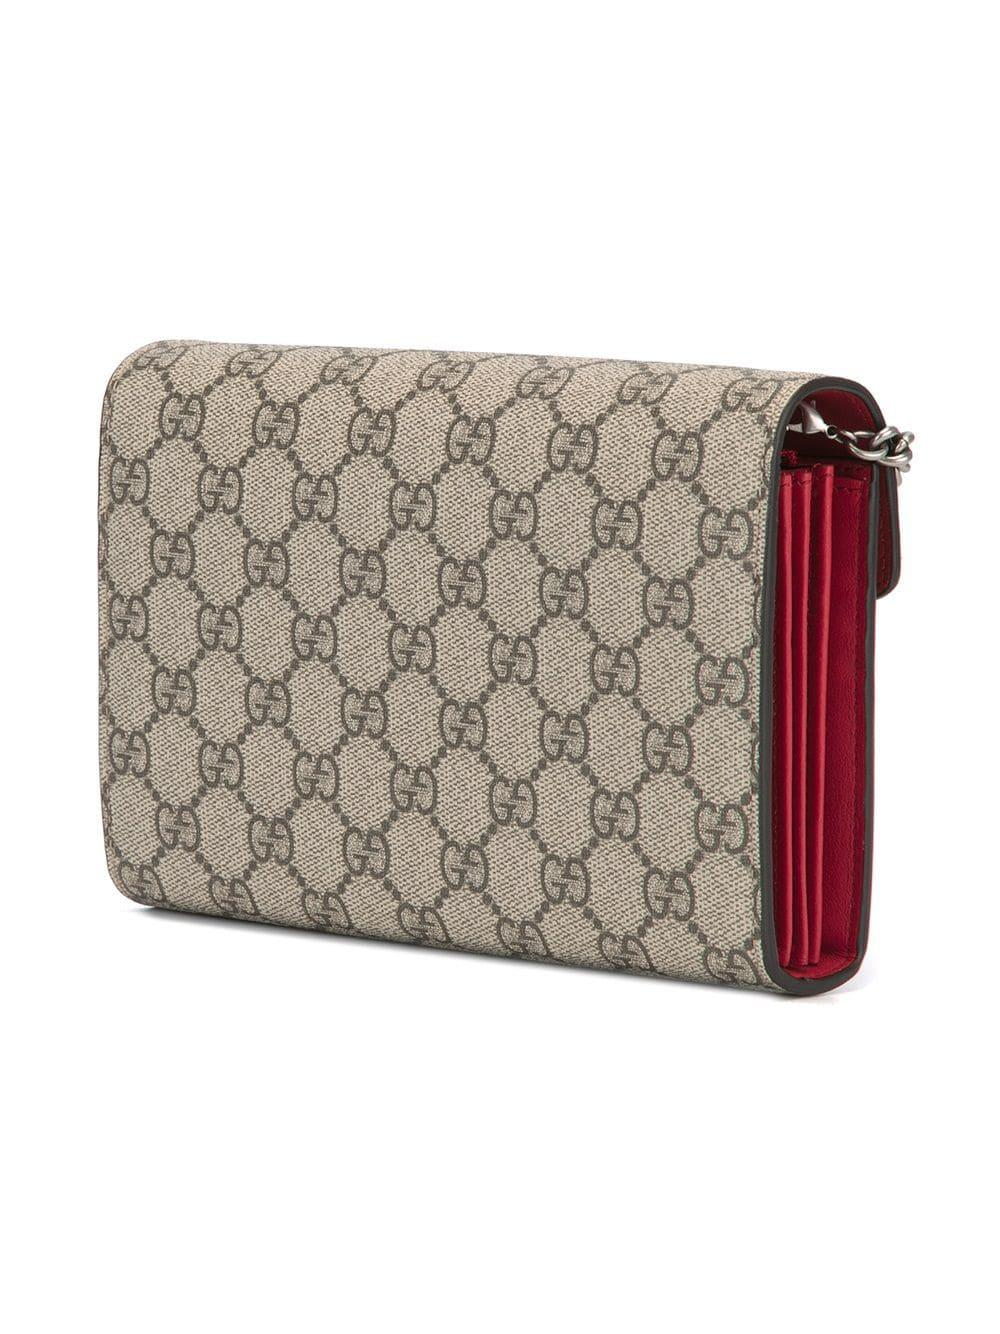 c8869ef01c4 Gucci - Multicolor Logo Print Crossbody Bag - Lyst. View fullscreen